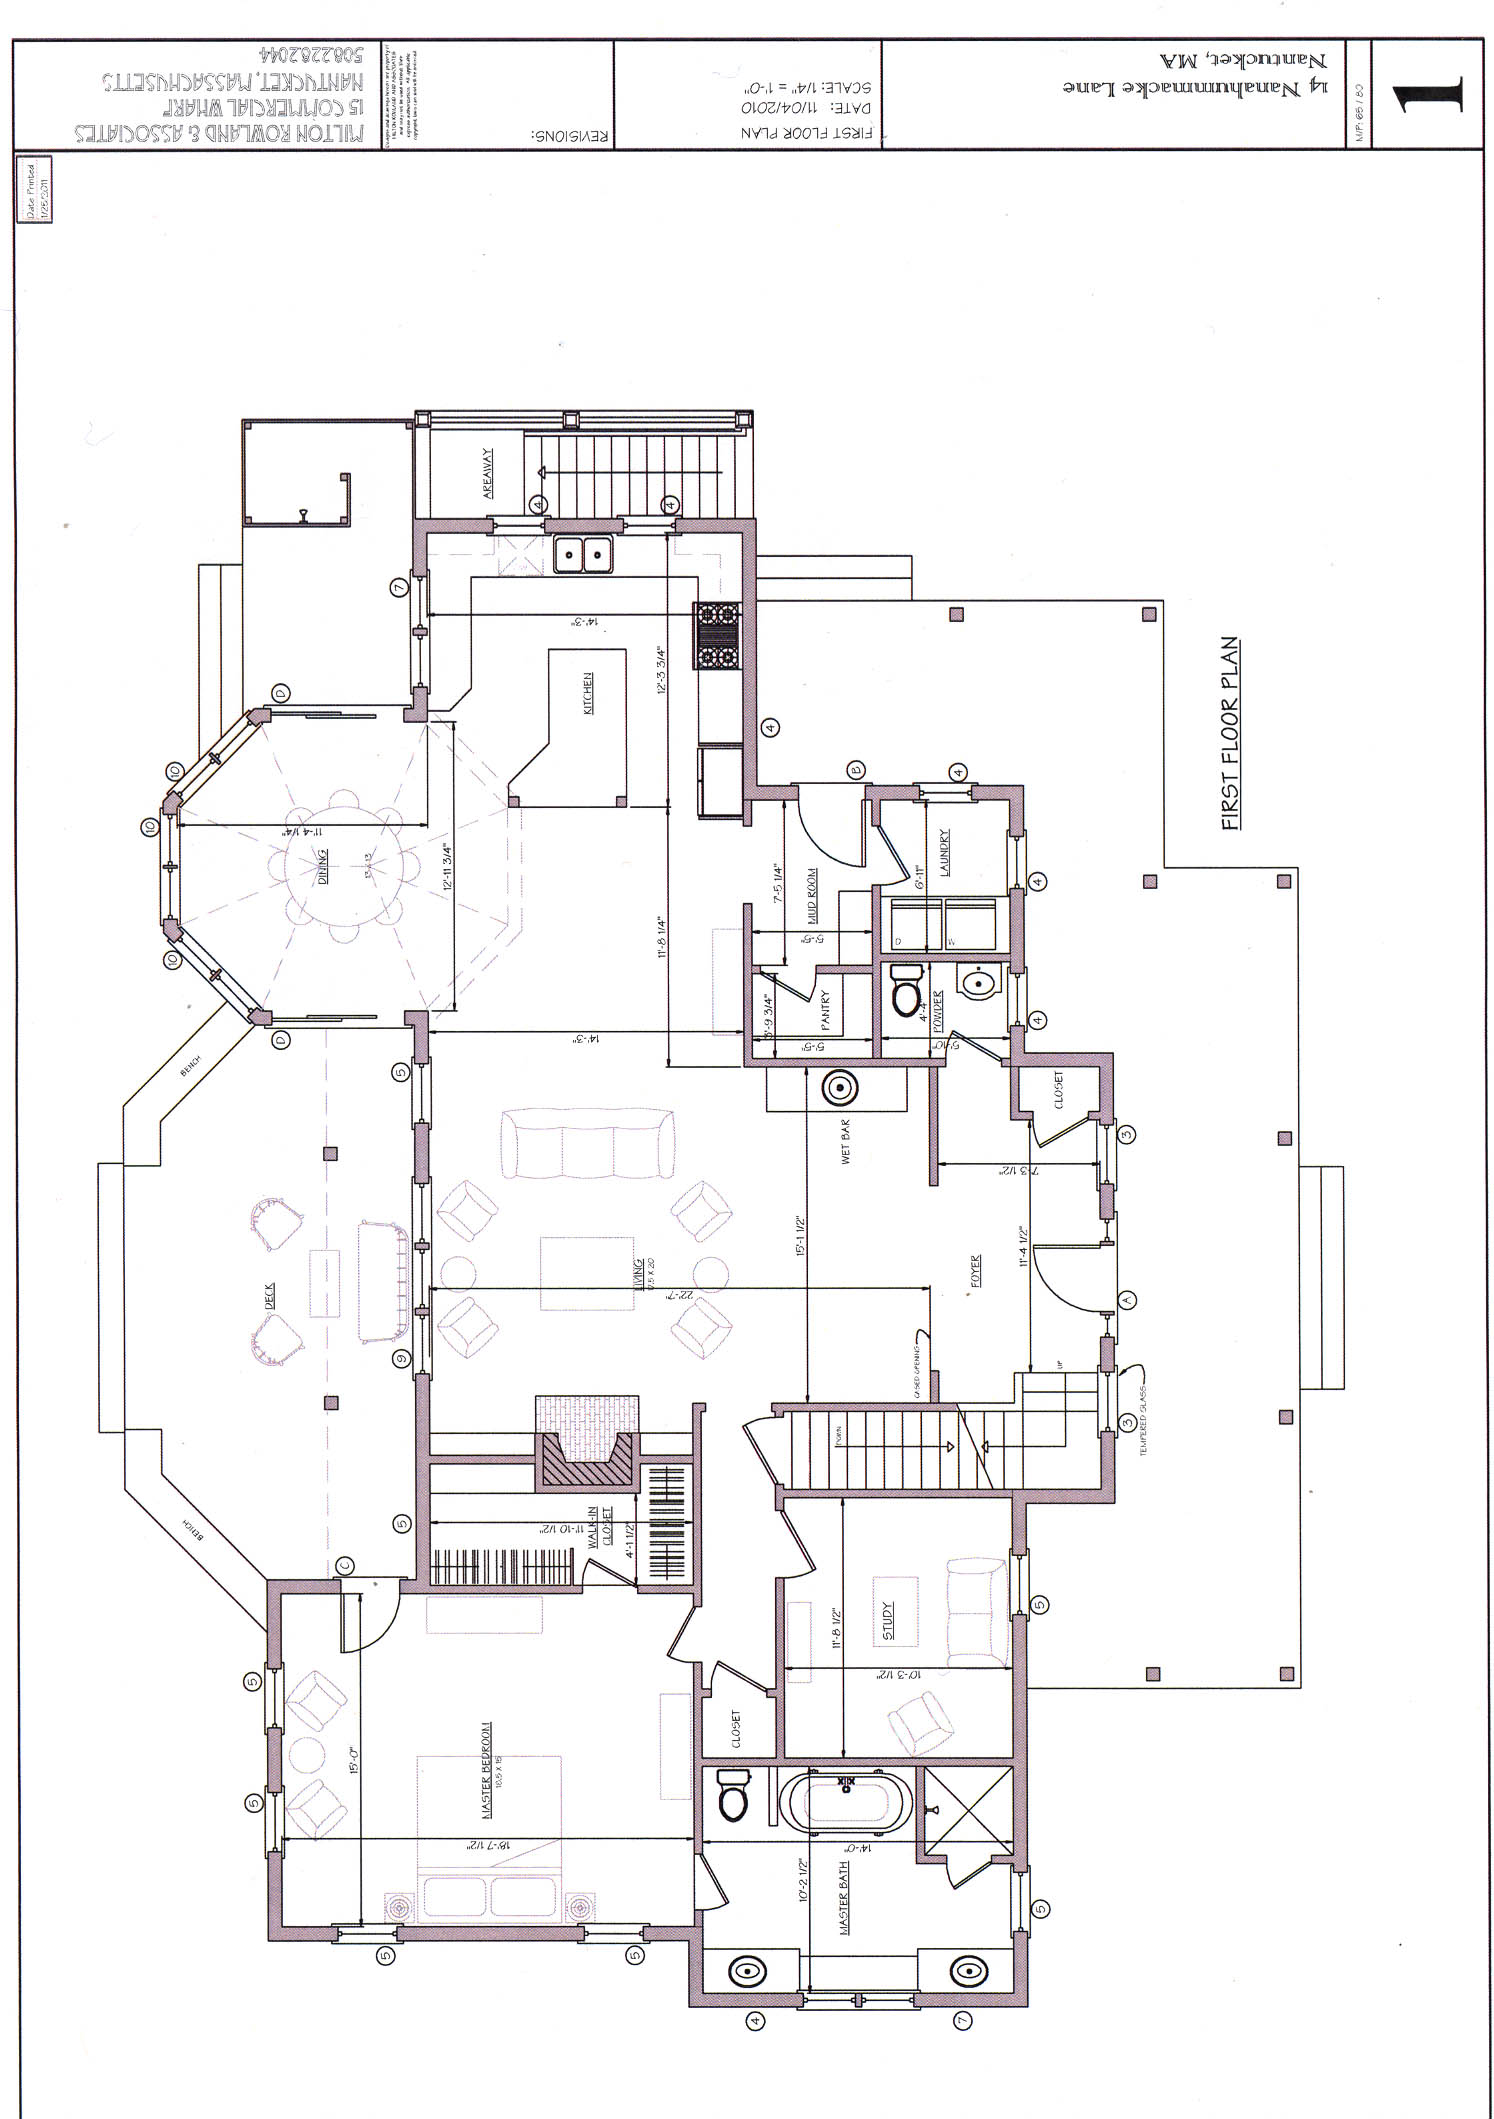 100 Octagon Floor Plans 57 Octagon Roof Plans